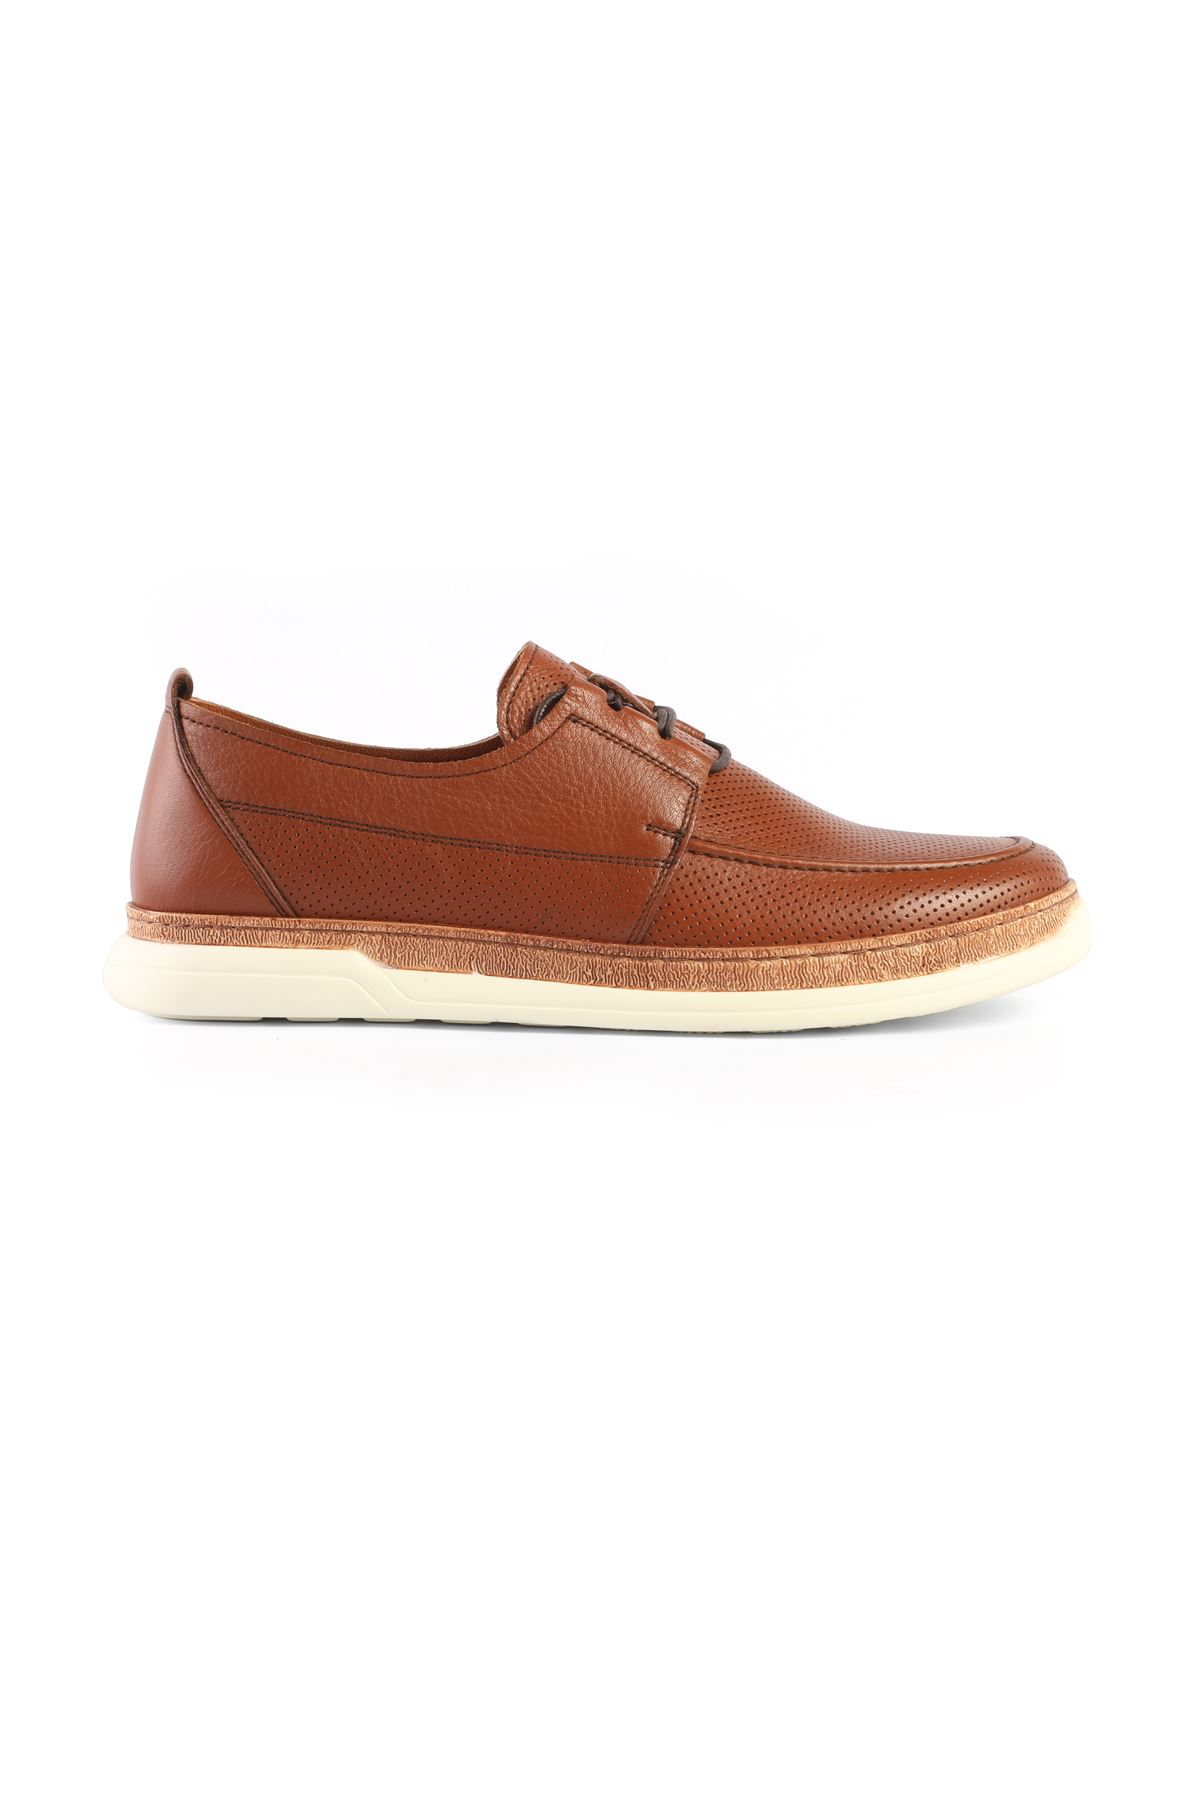 Libero L3418 Tan Loafer Shoes